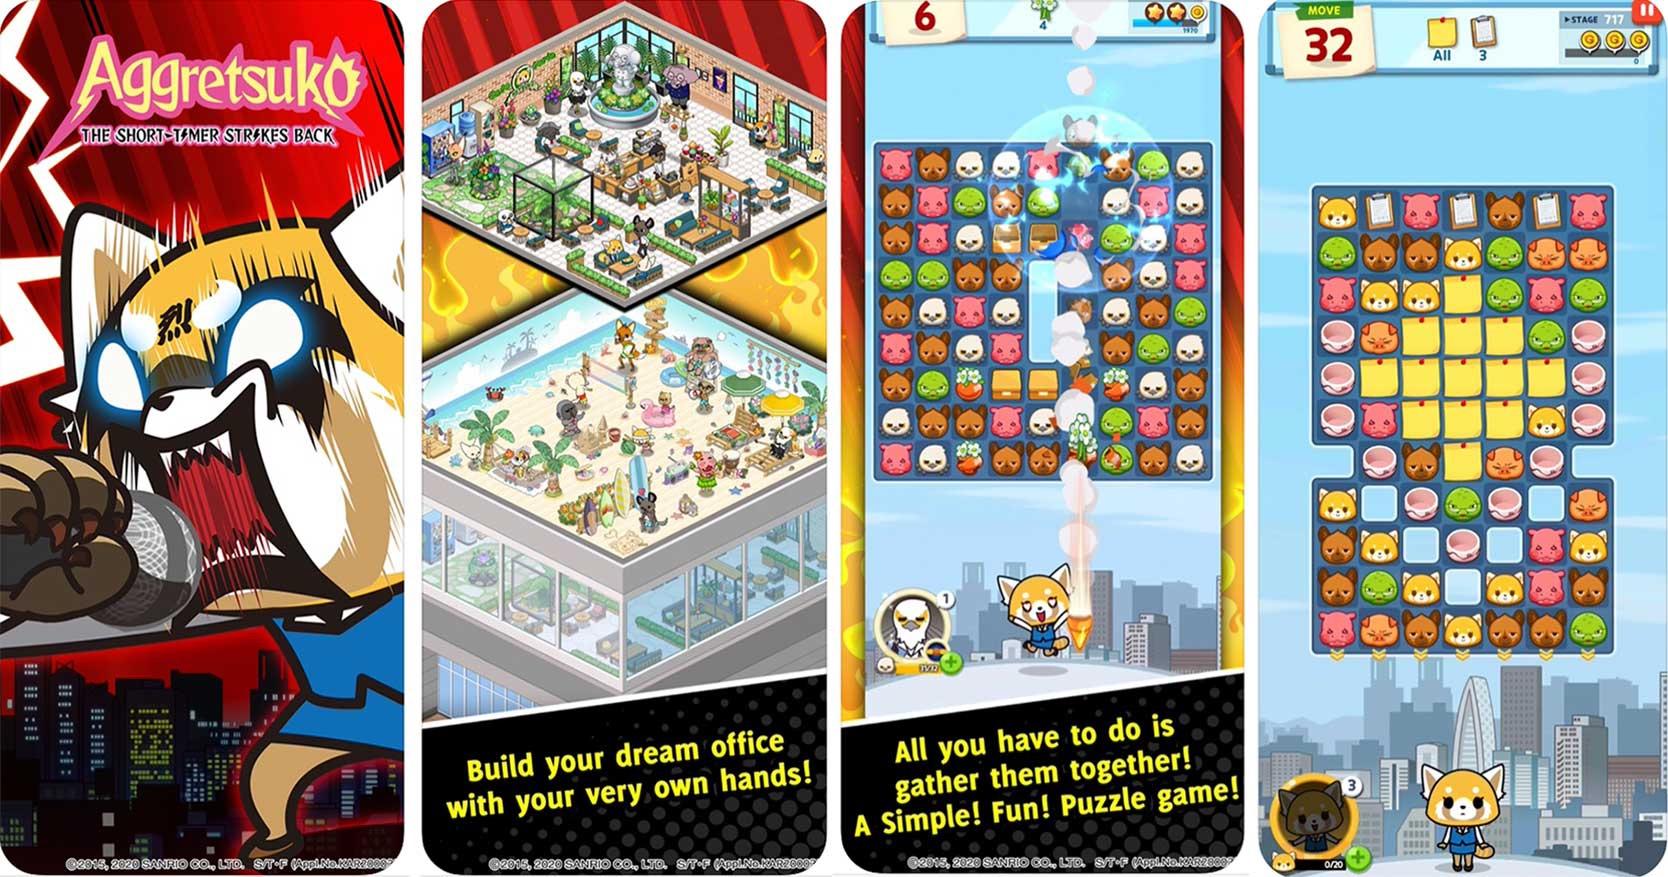 screenshot of aggretsuko iPhone game